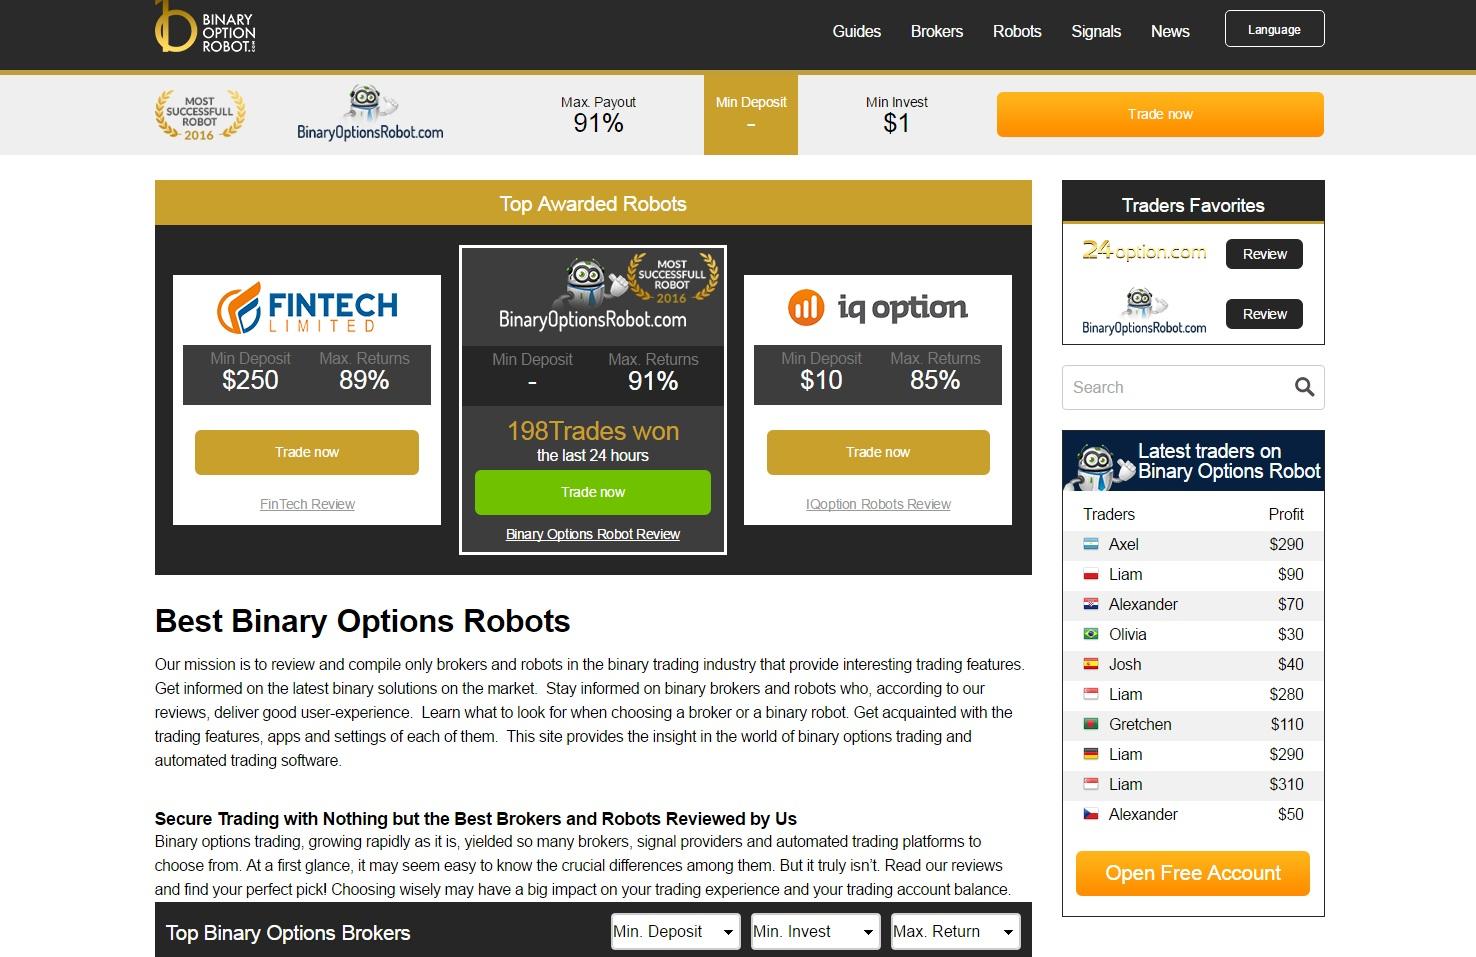 Robot binar automat - Opțiuni binare Robot Abi: 2. OptionRobot